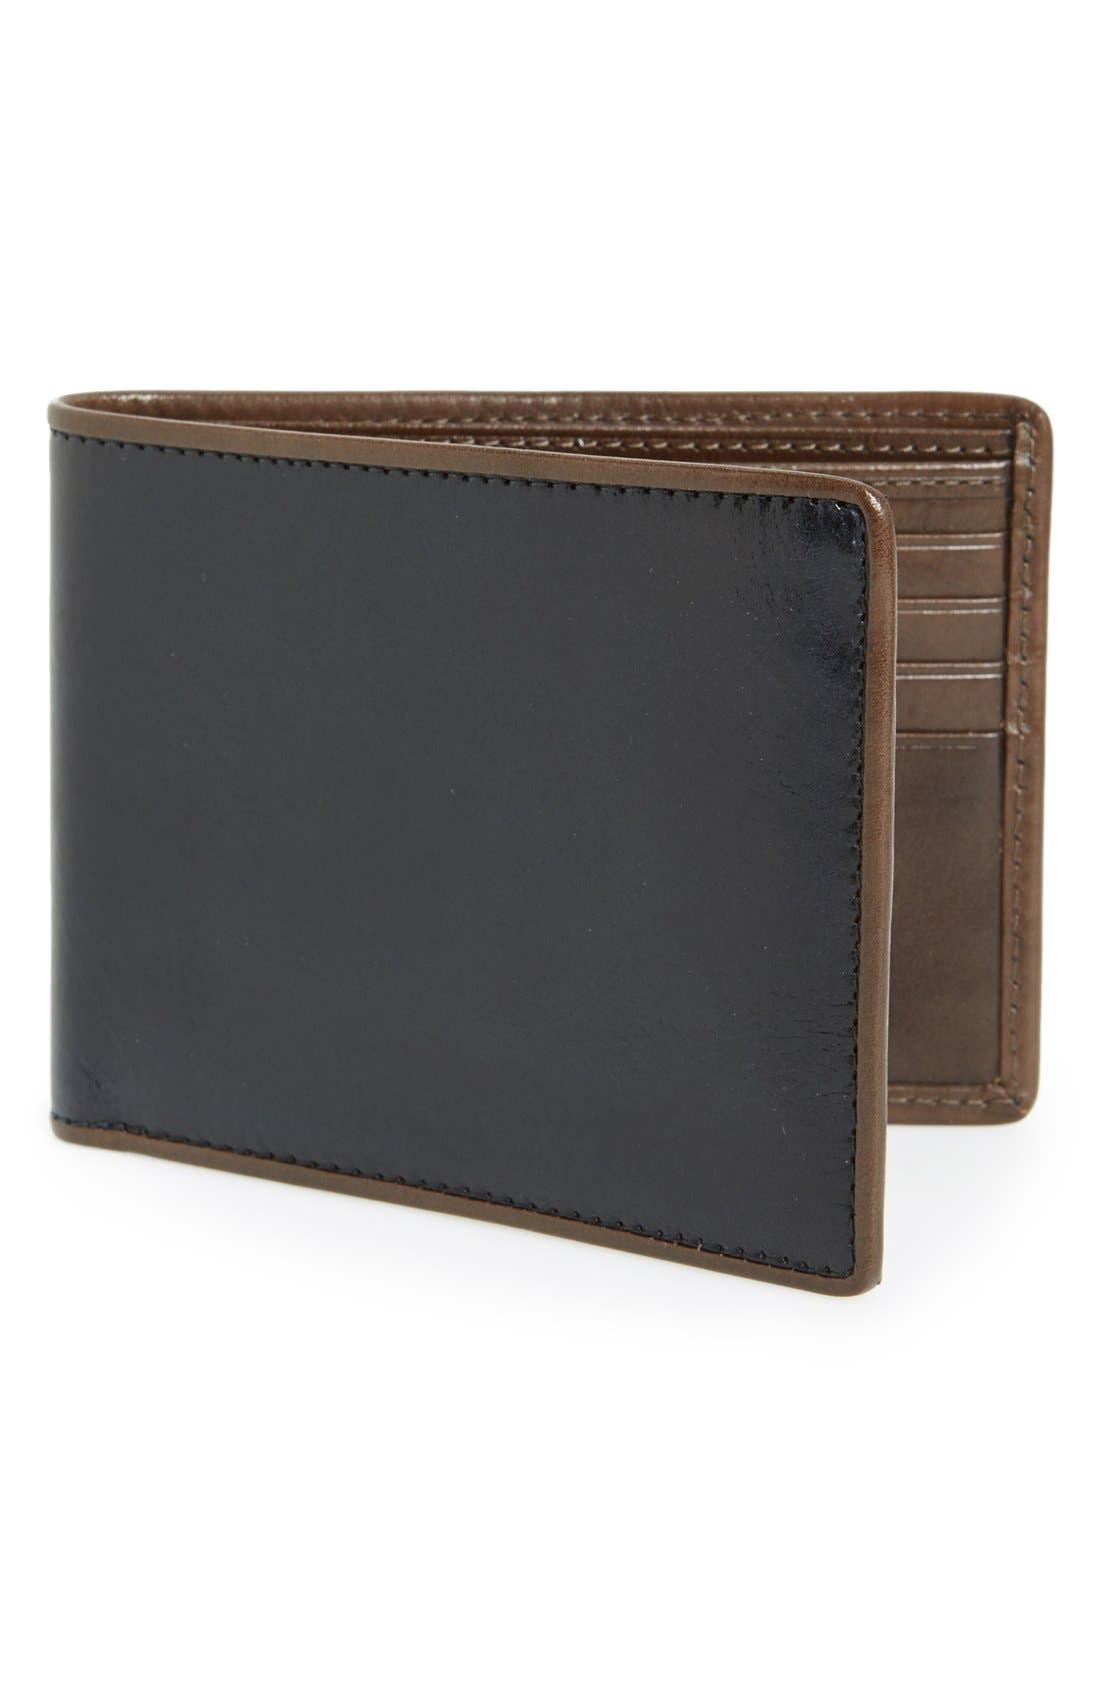 Main Image - Bosca 'Montreal' Wallet